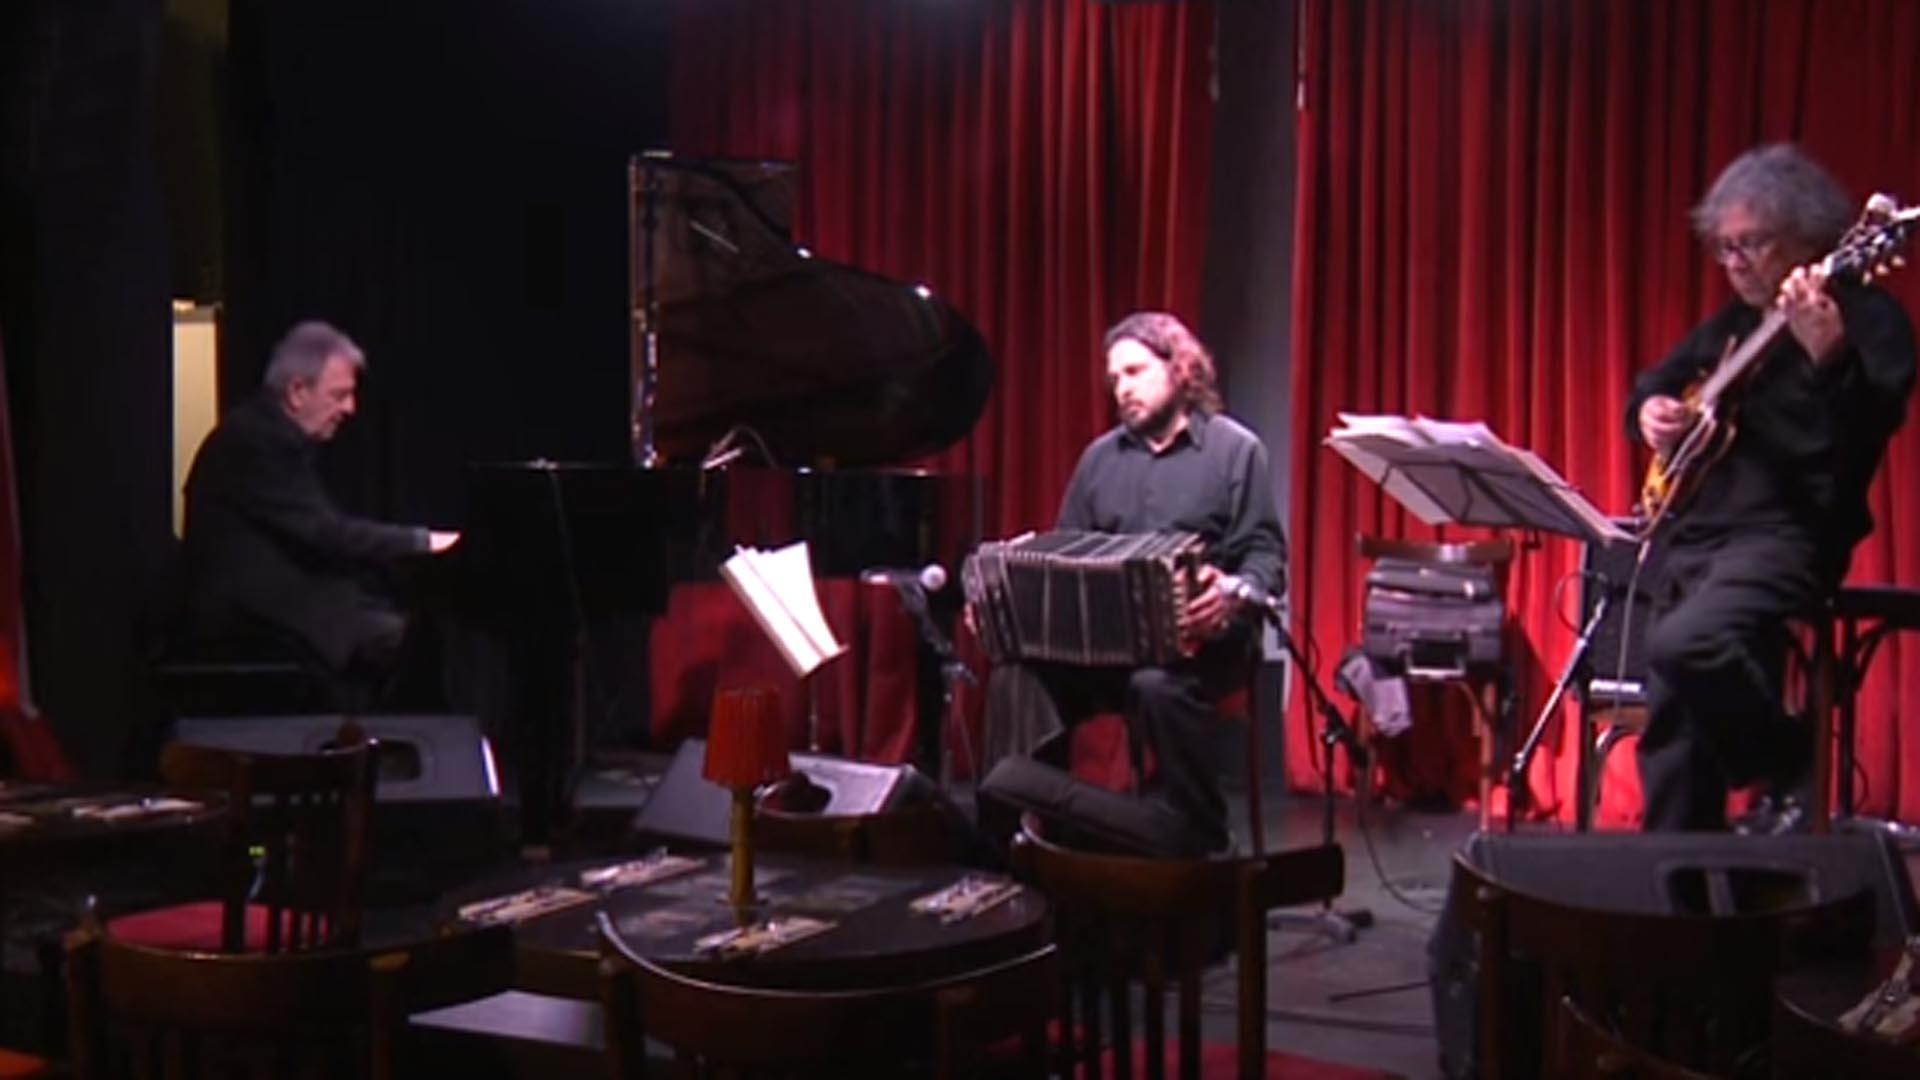 El argentino Pablo Ziegler triunfó en jazz latino — Premios Grammy